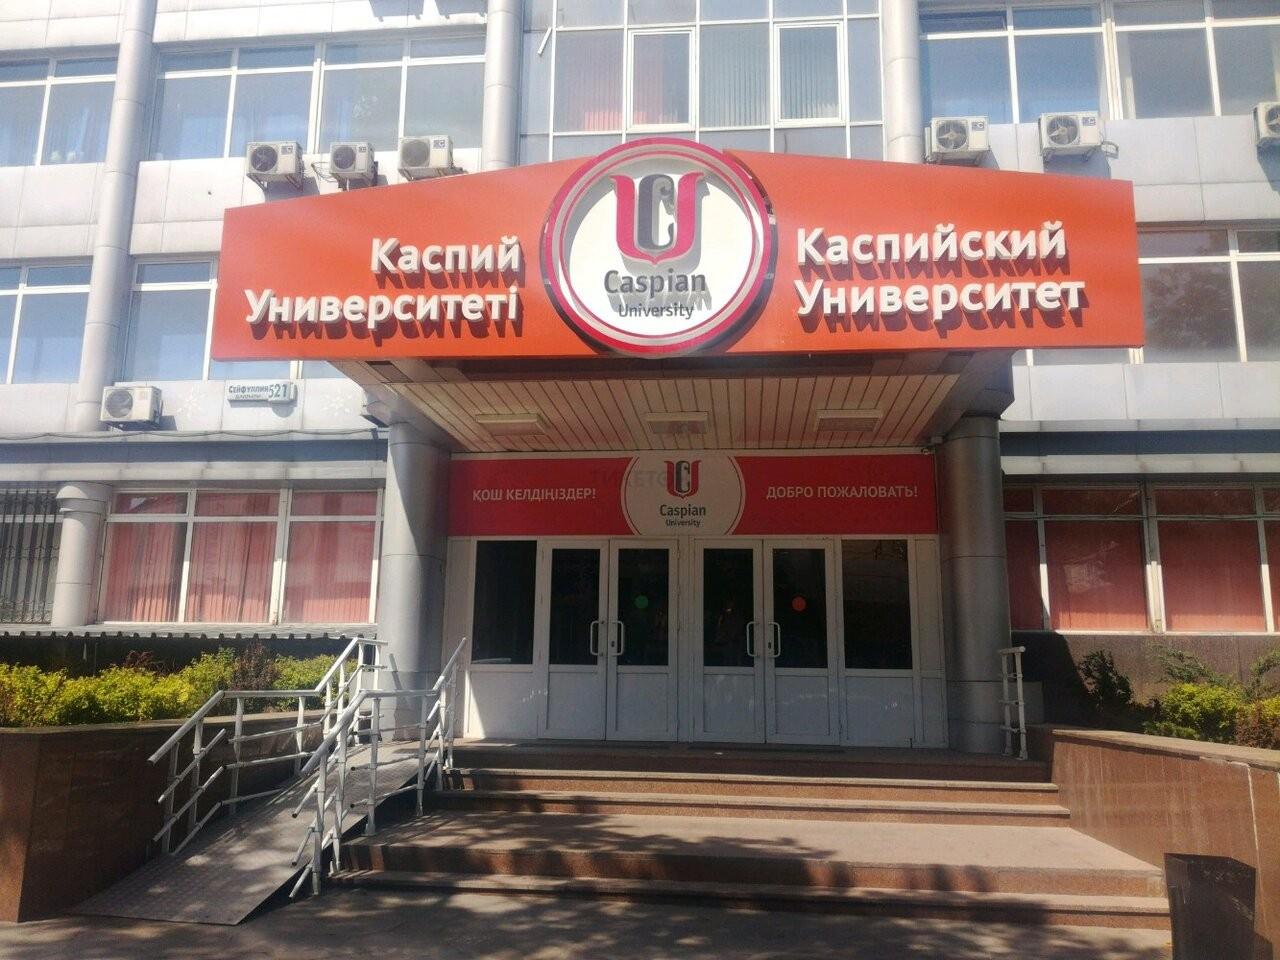 Caspian University